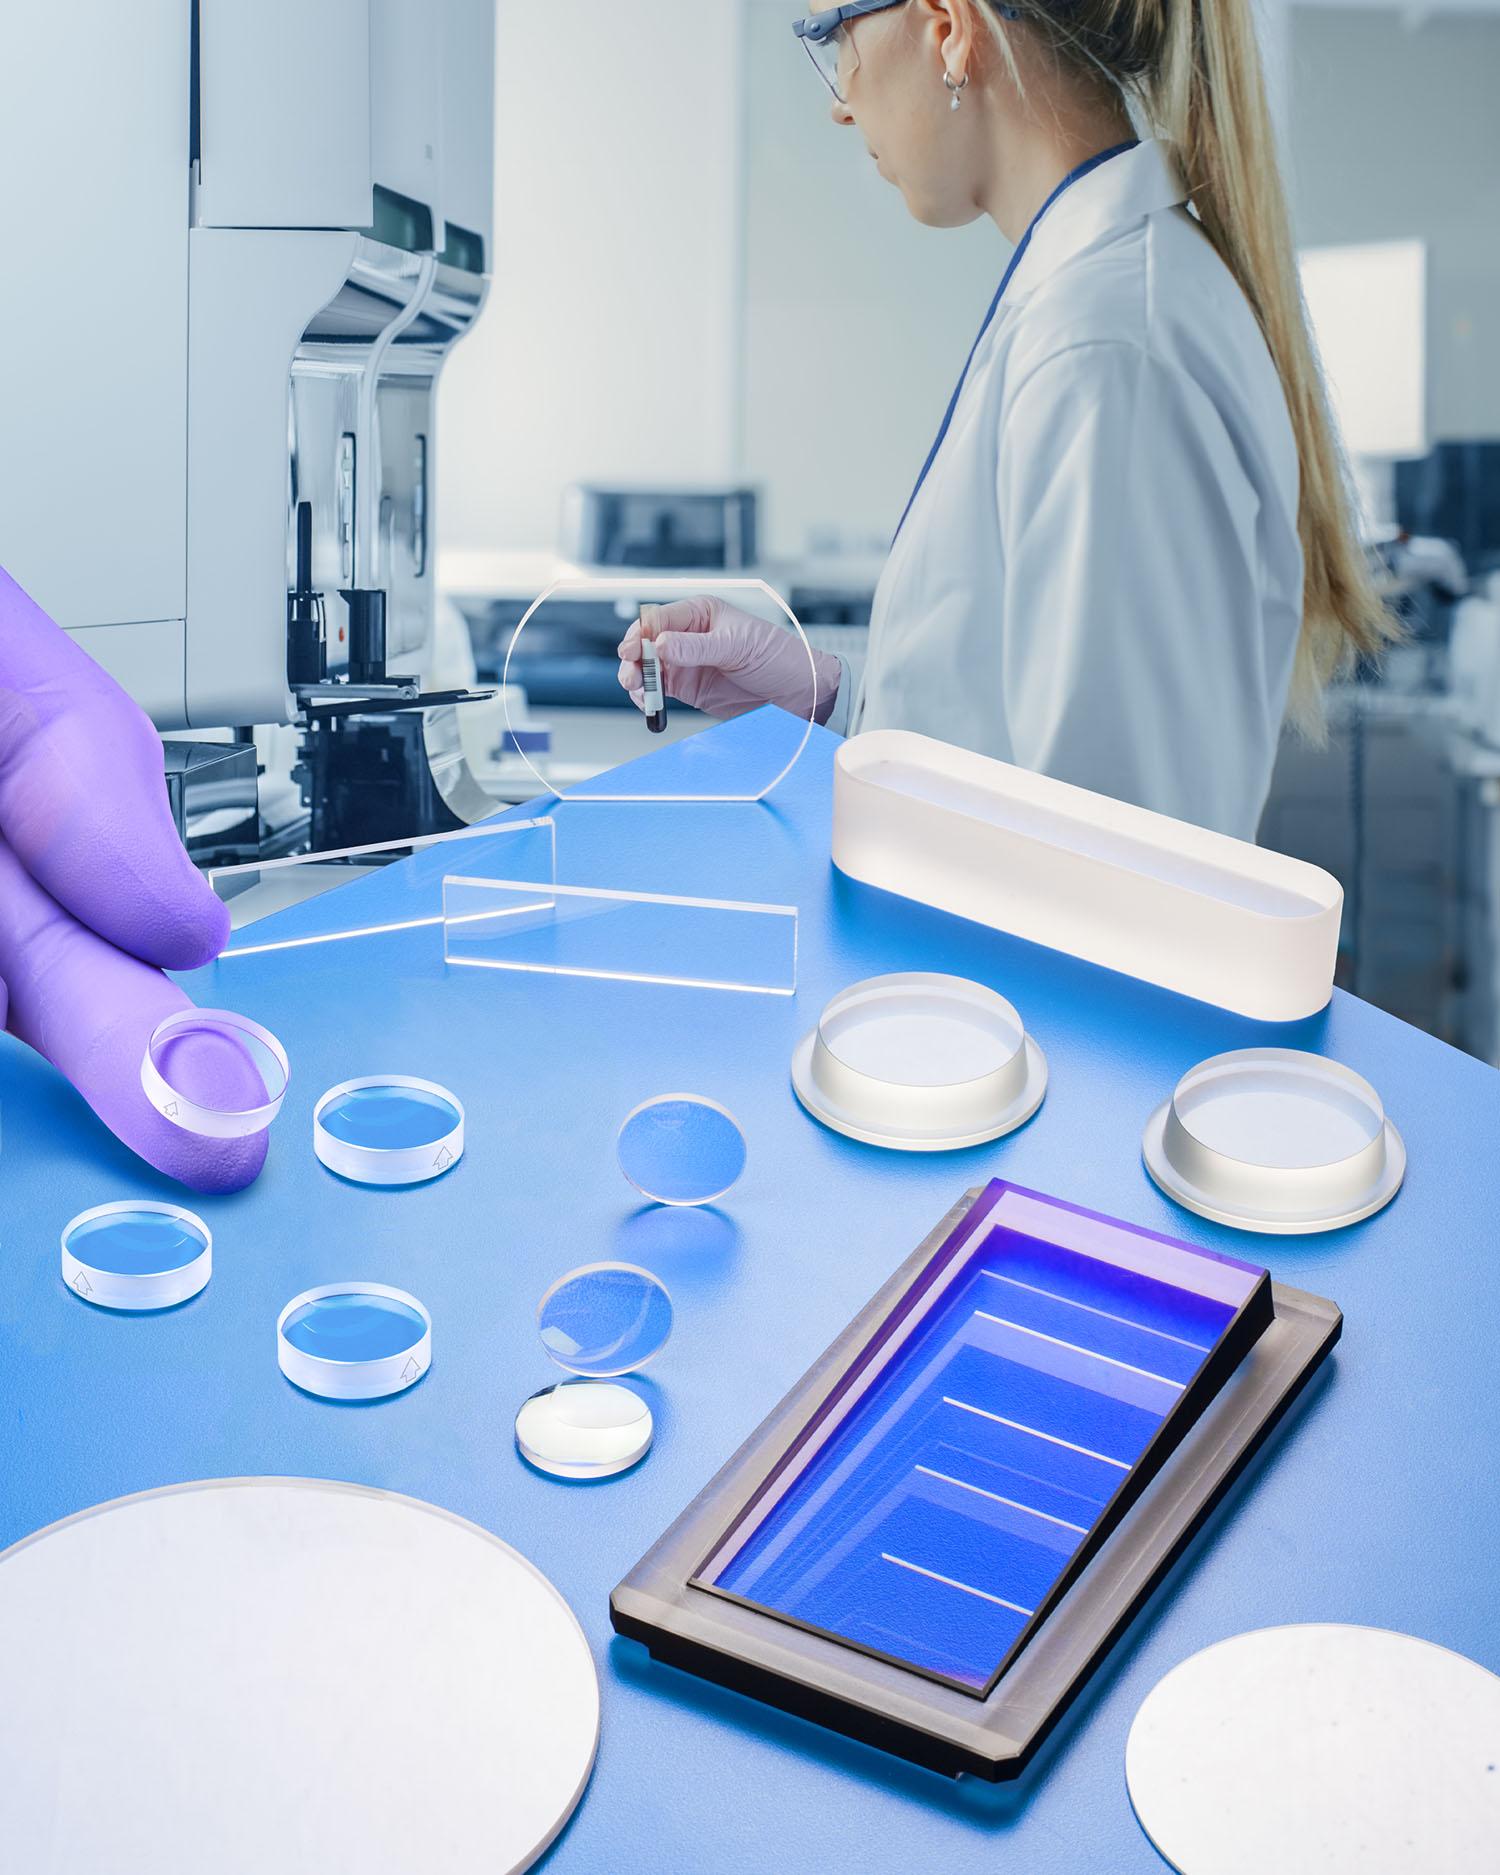 sapphire optics for medical applications